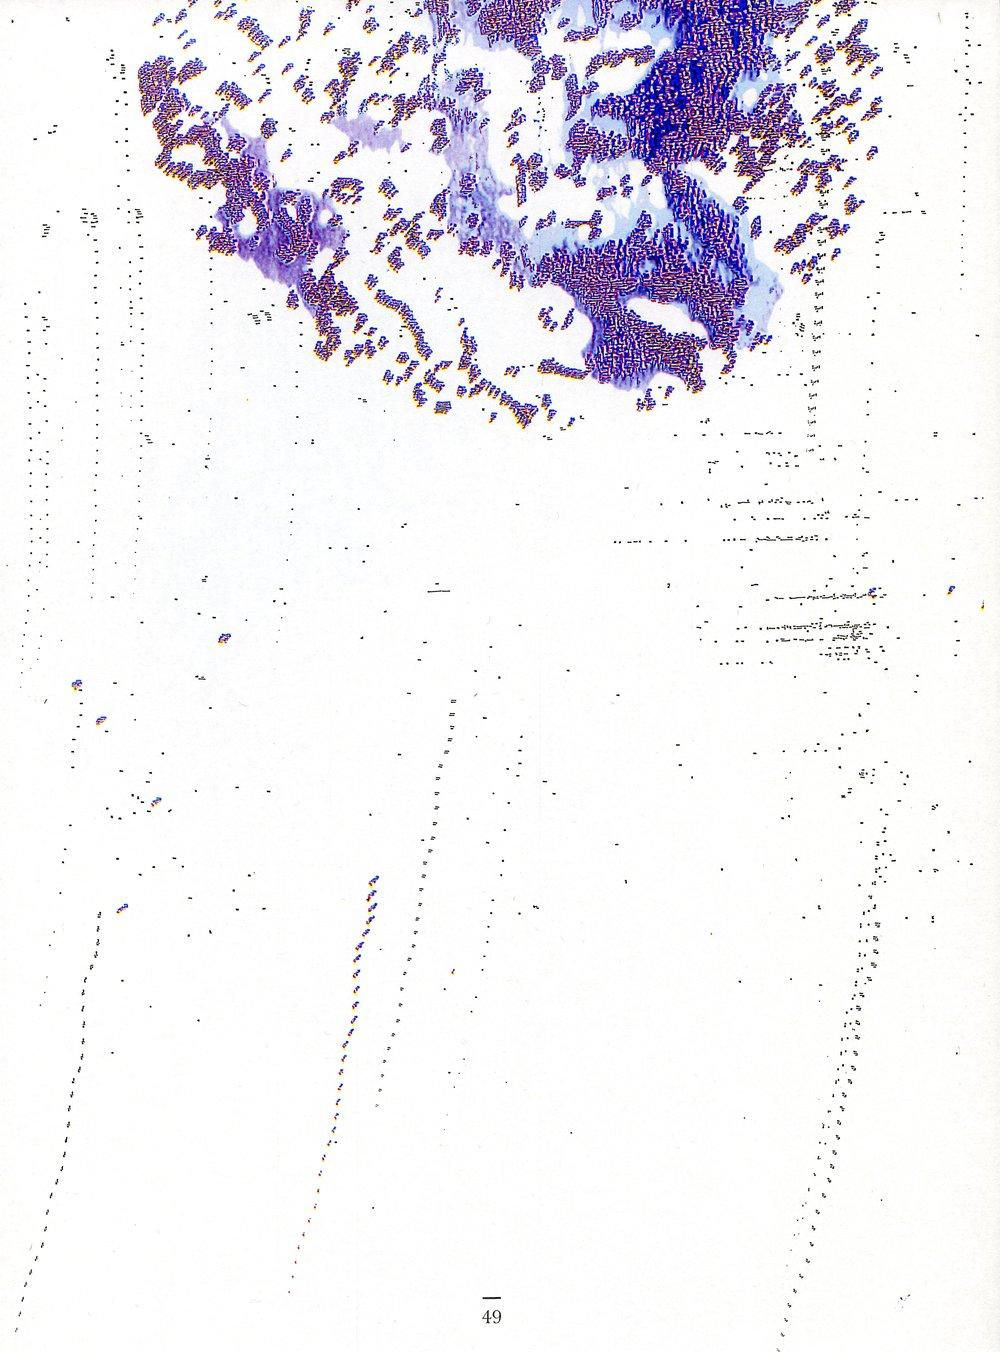 Maakbaarheid012.jpg